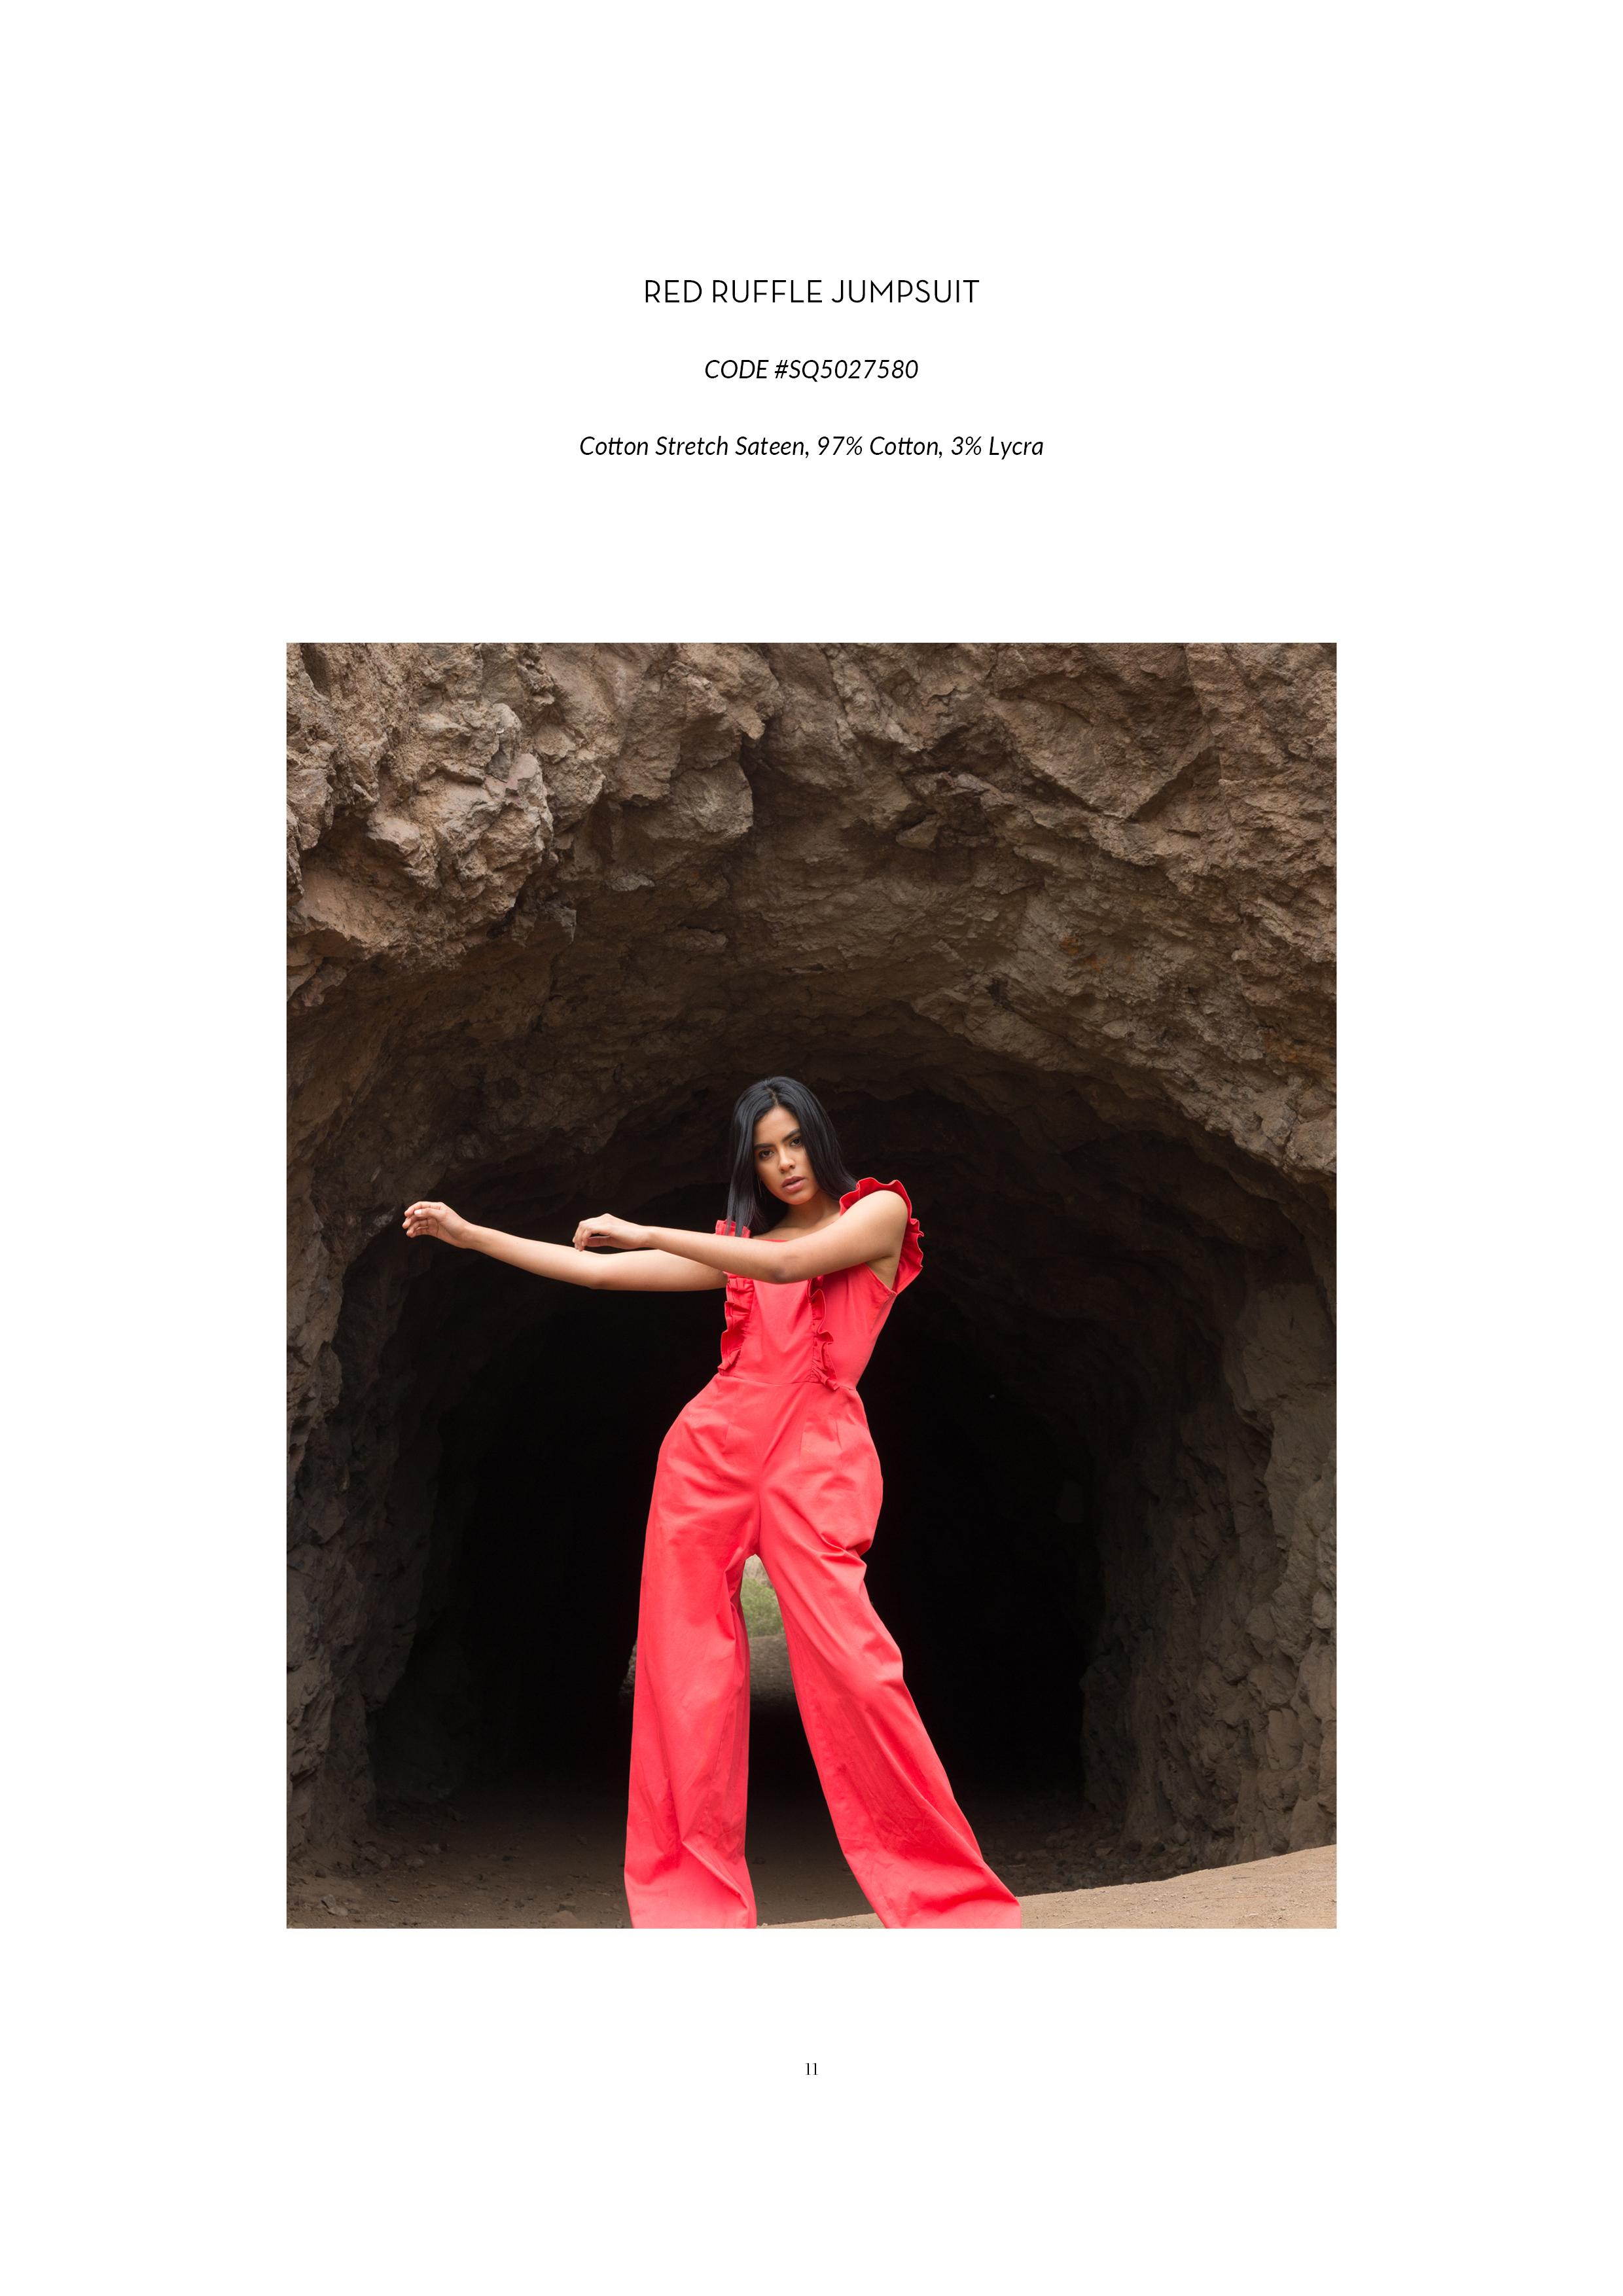 Tiena-Lookbook-Images11.jpg